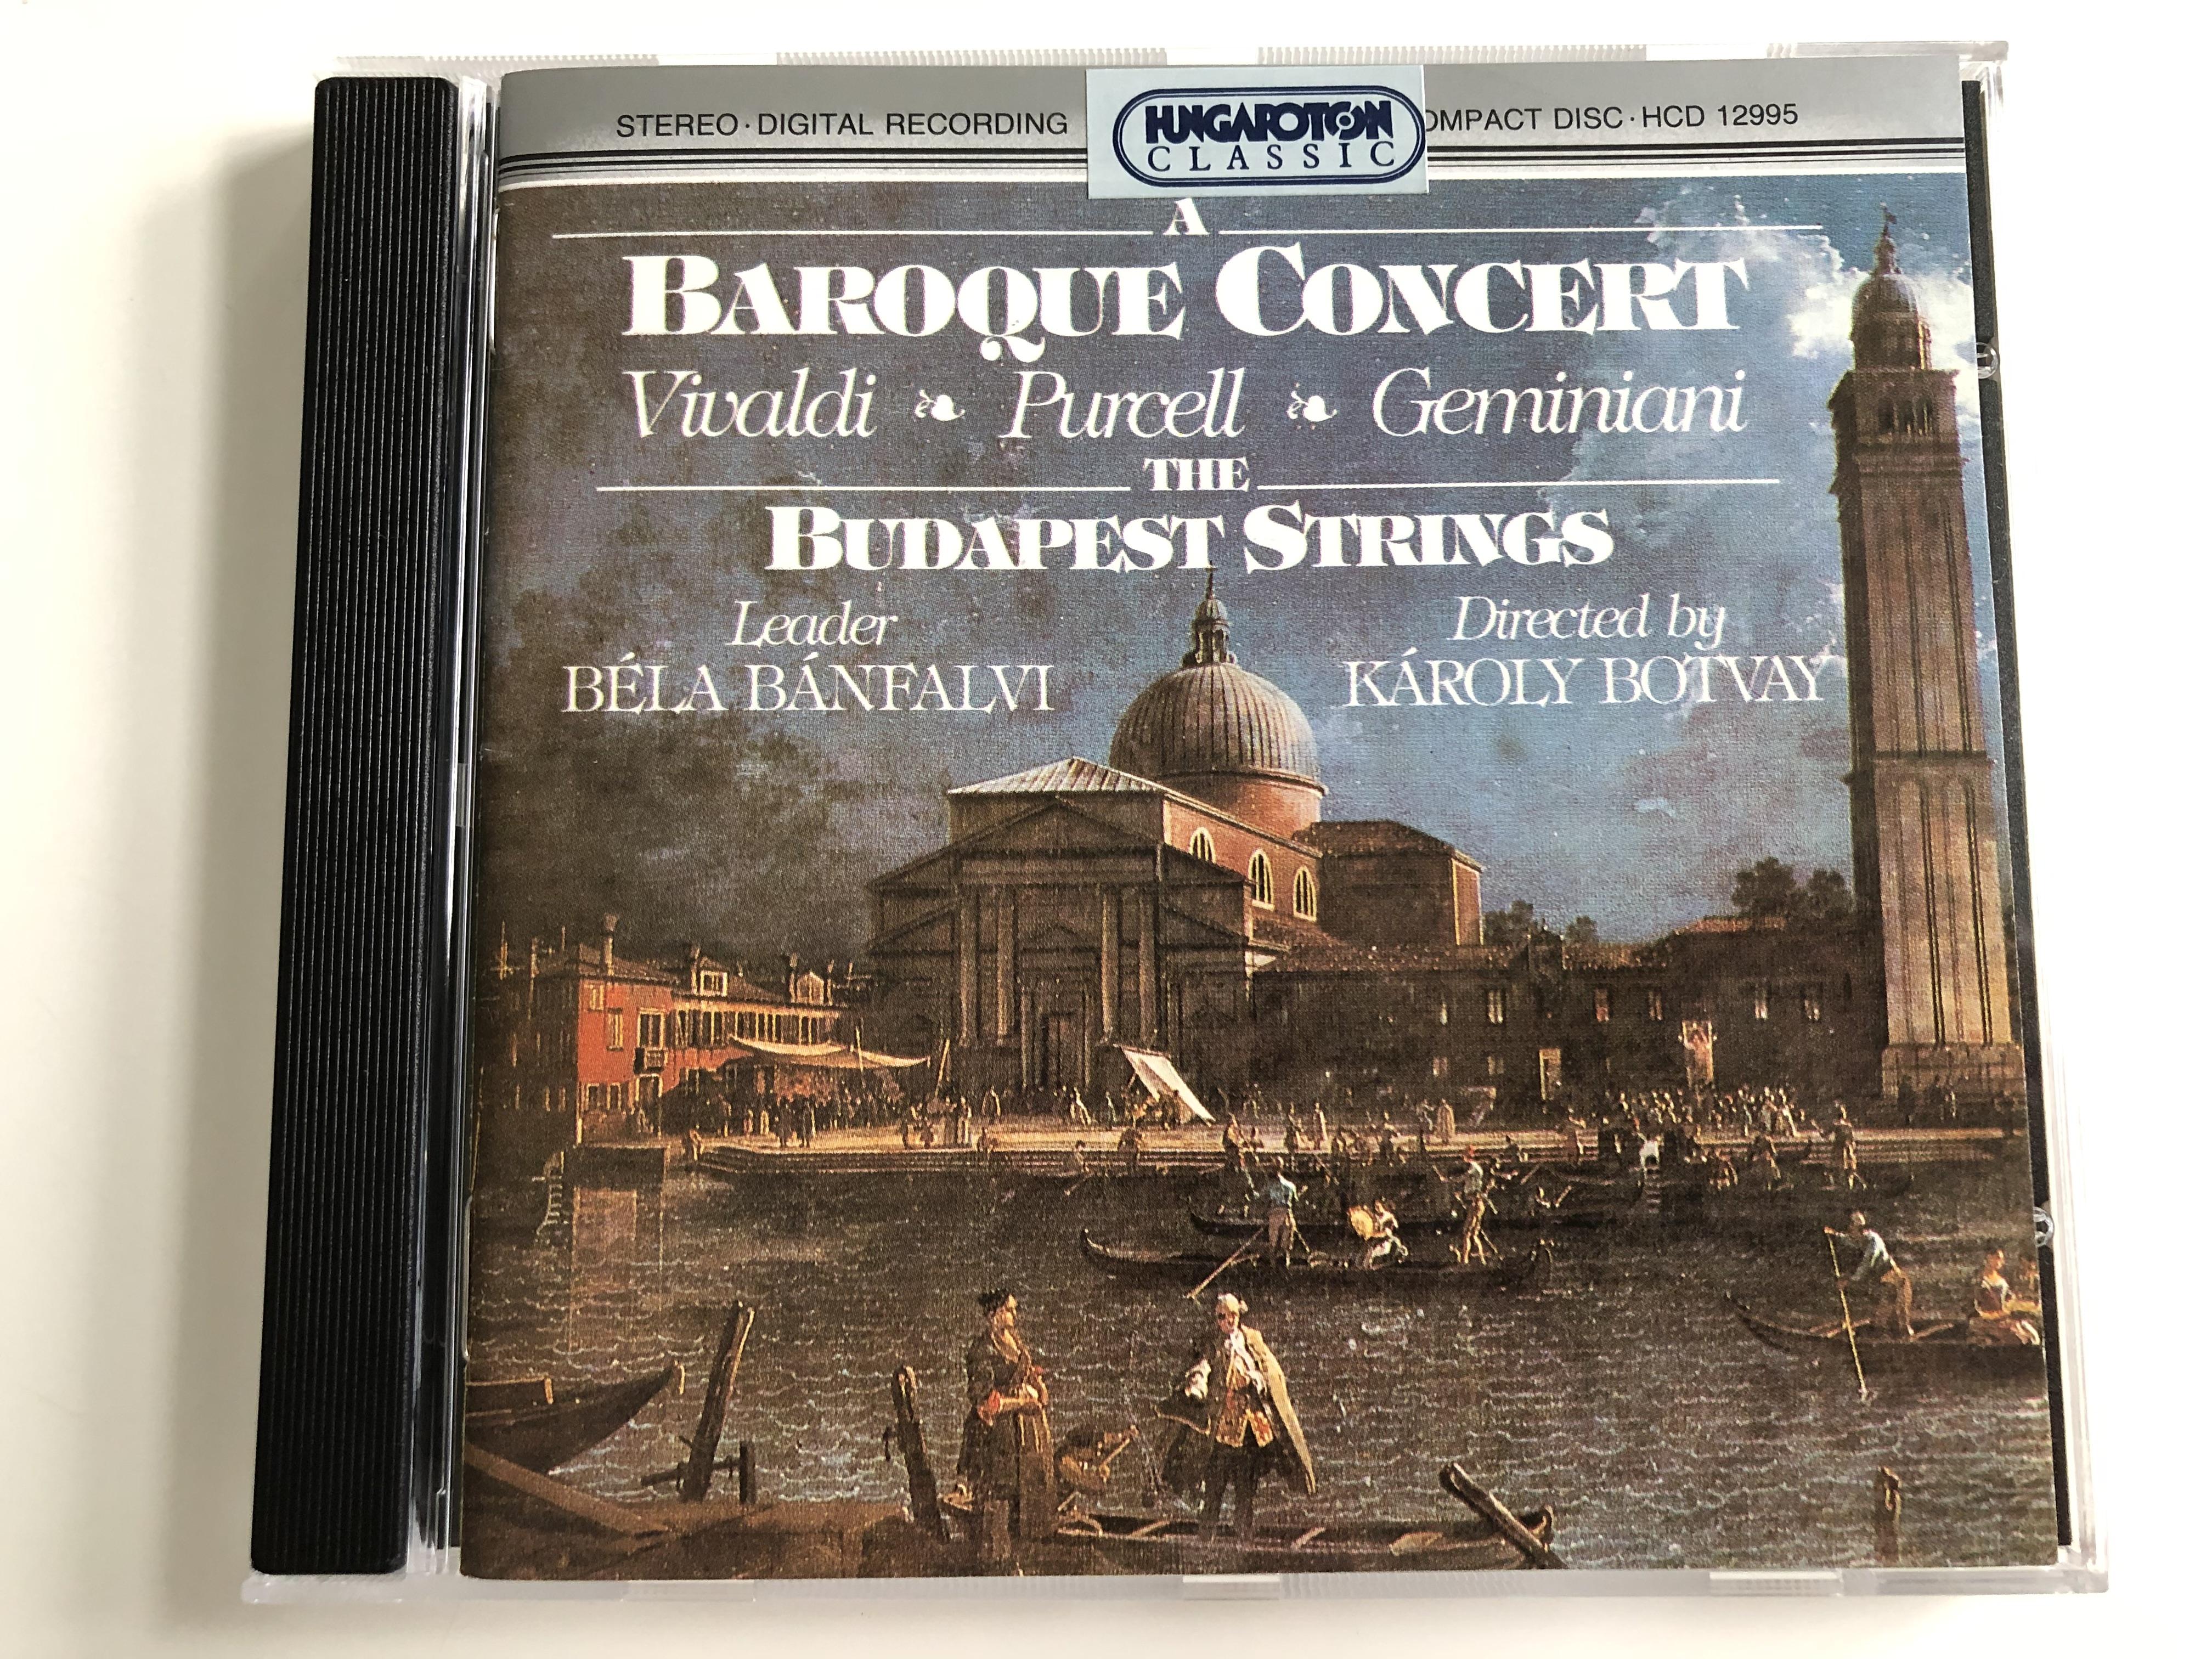 a-baroque-concert-vivaldi-purcell-geminiani-the-budapest-strings-leader-b-la-b-nfalvi-directed-by-k-roly-botvay-hungaroton-audio-cd-1995-stereo-hcd-12995-1-.jpg